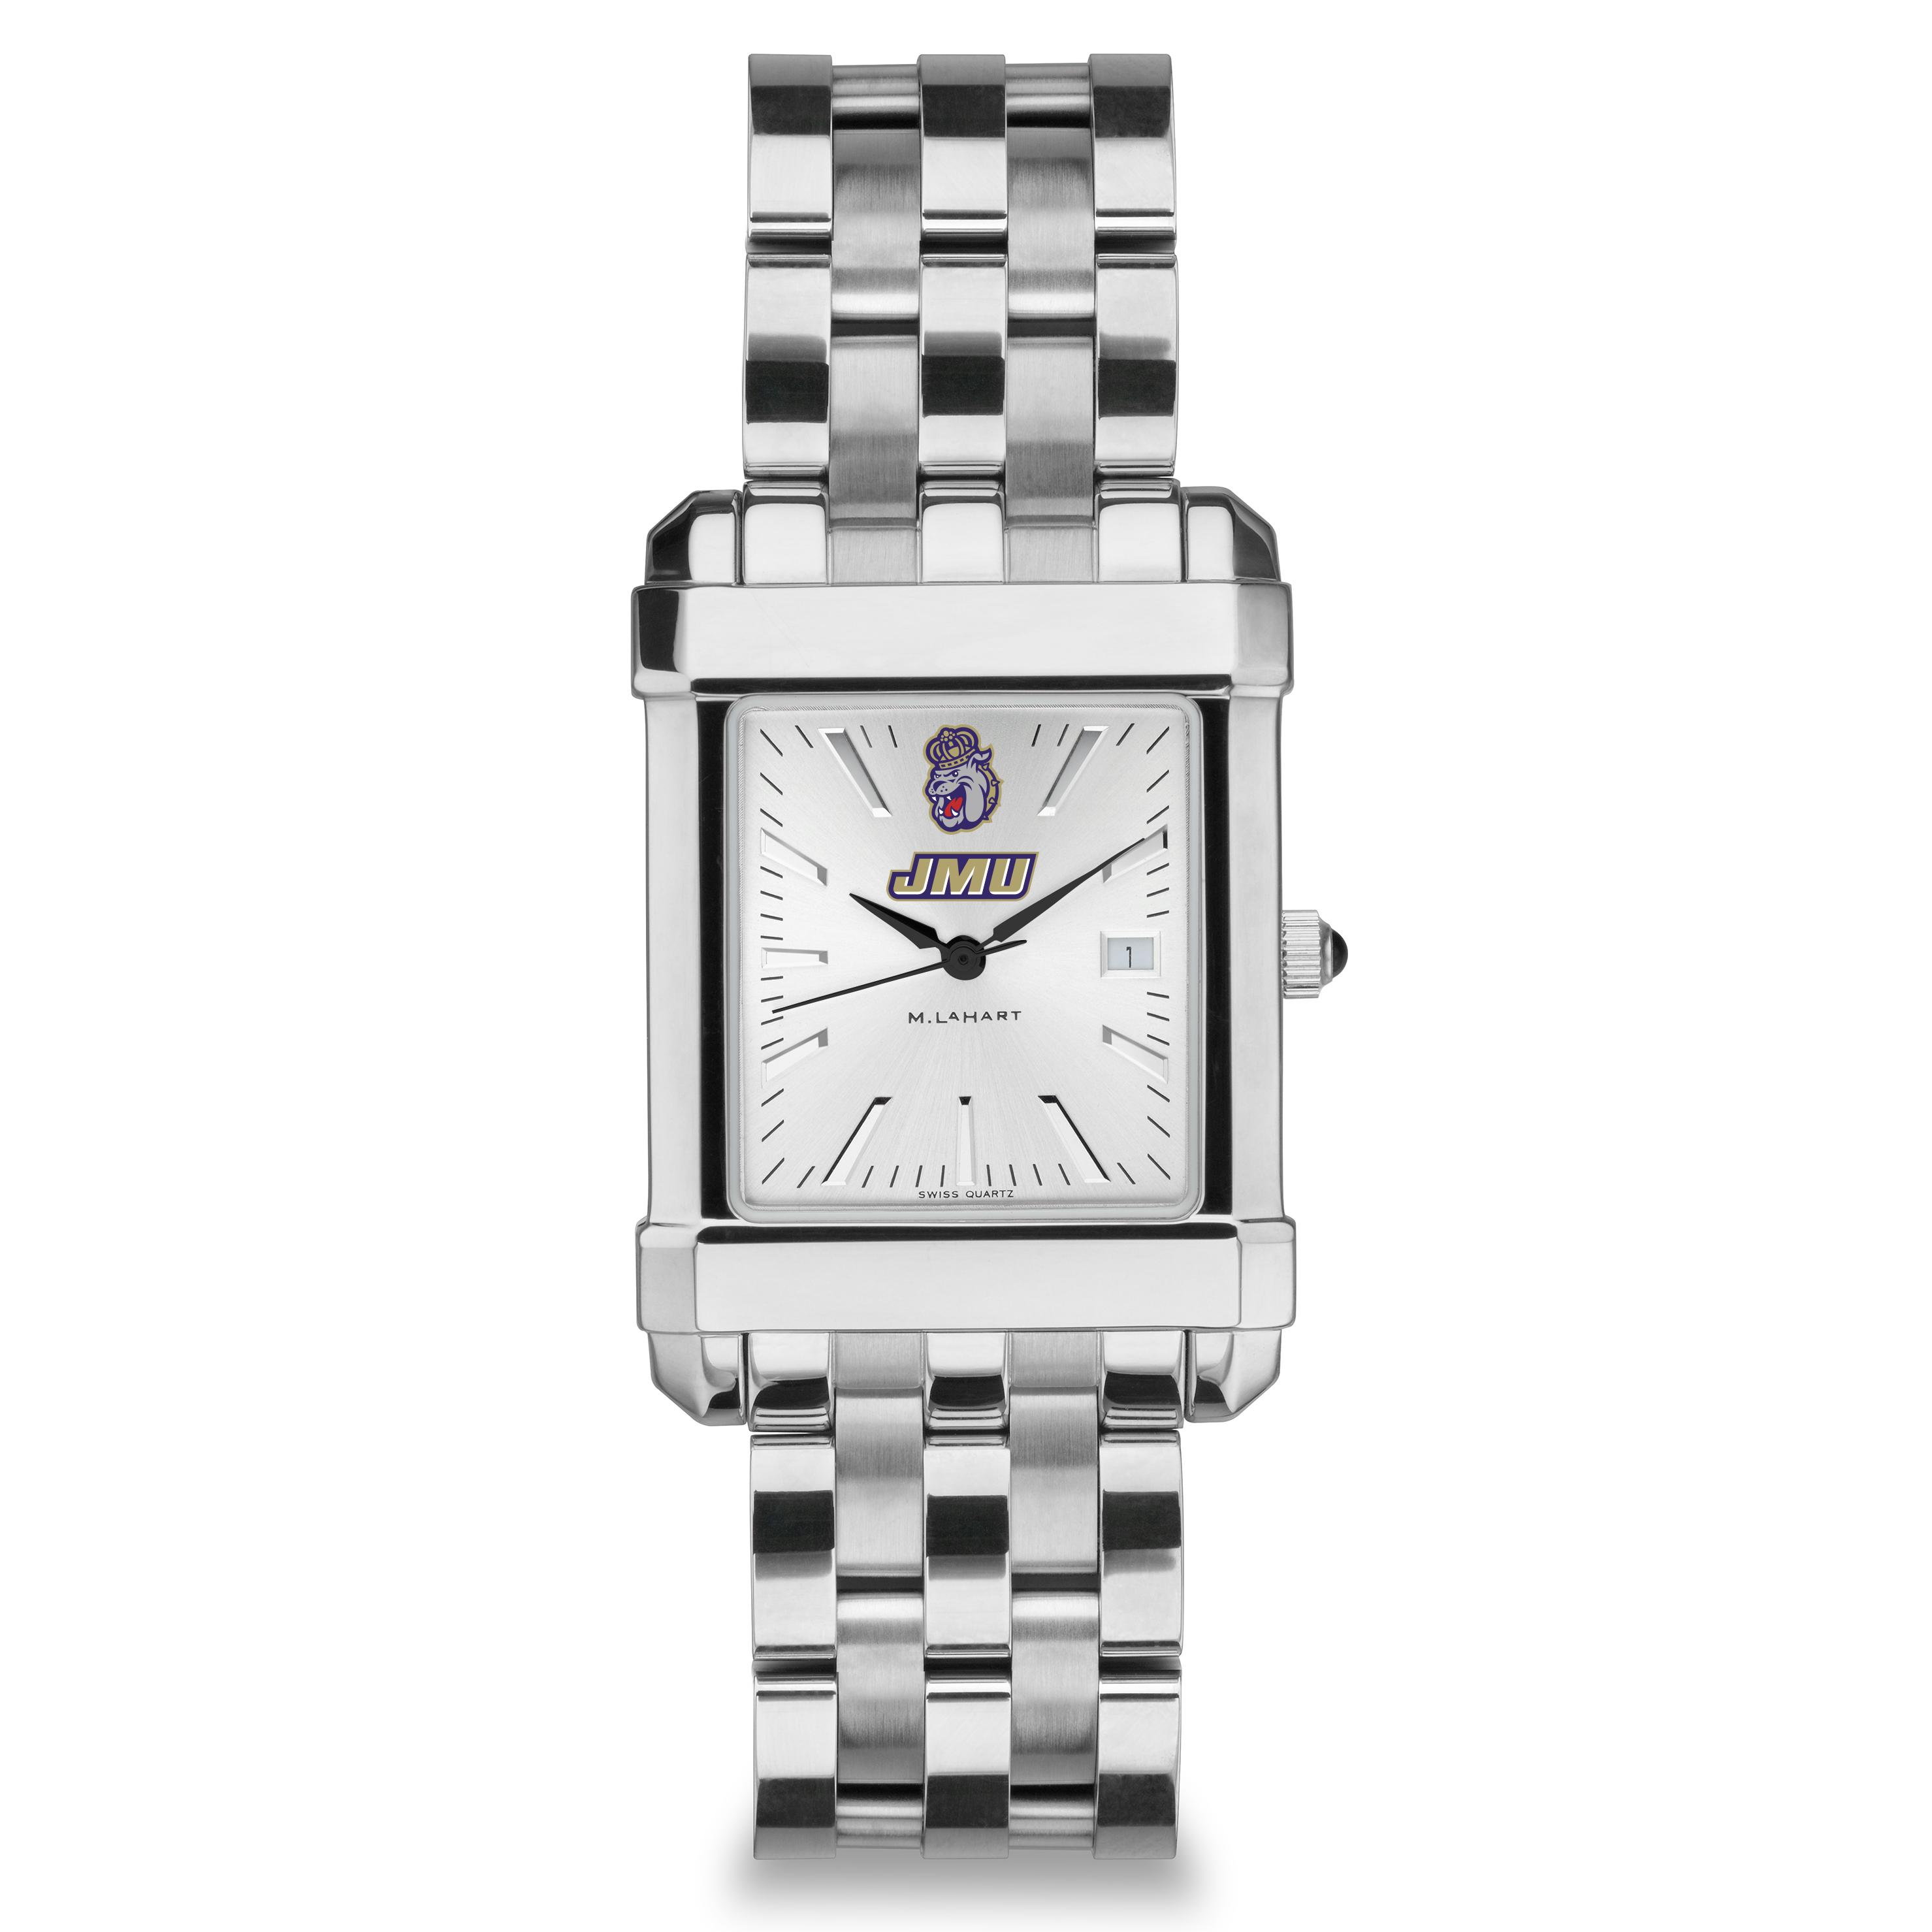 James Madison Men's Collegiate Watch w/ Bracelet - Image 2